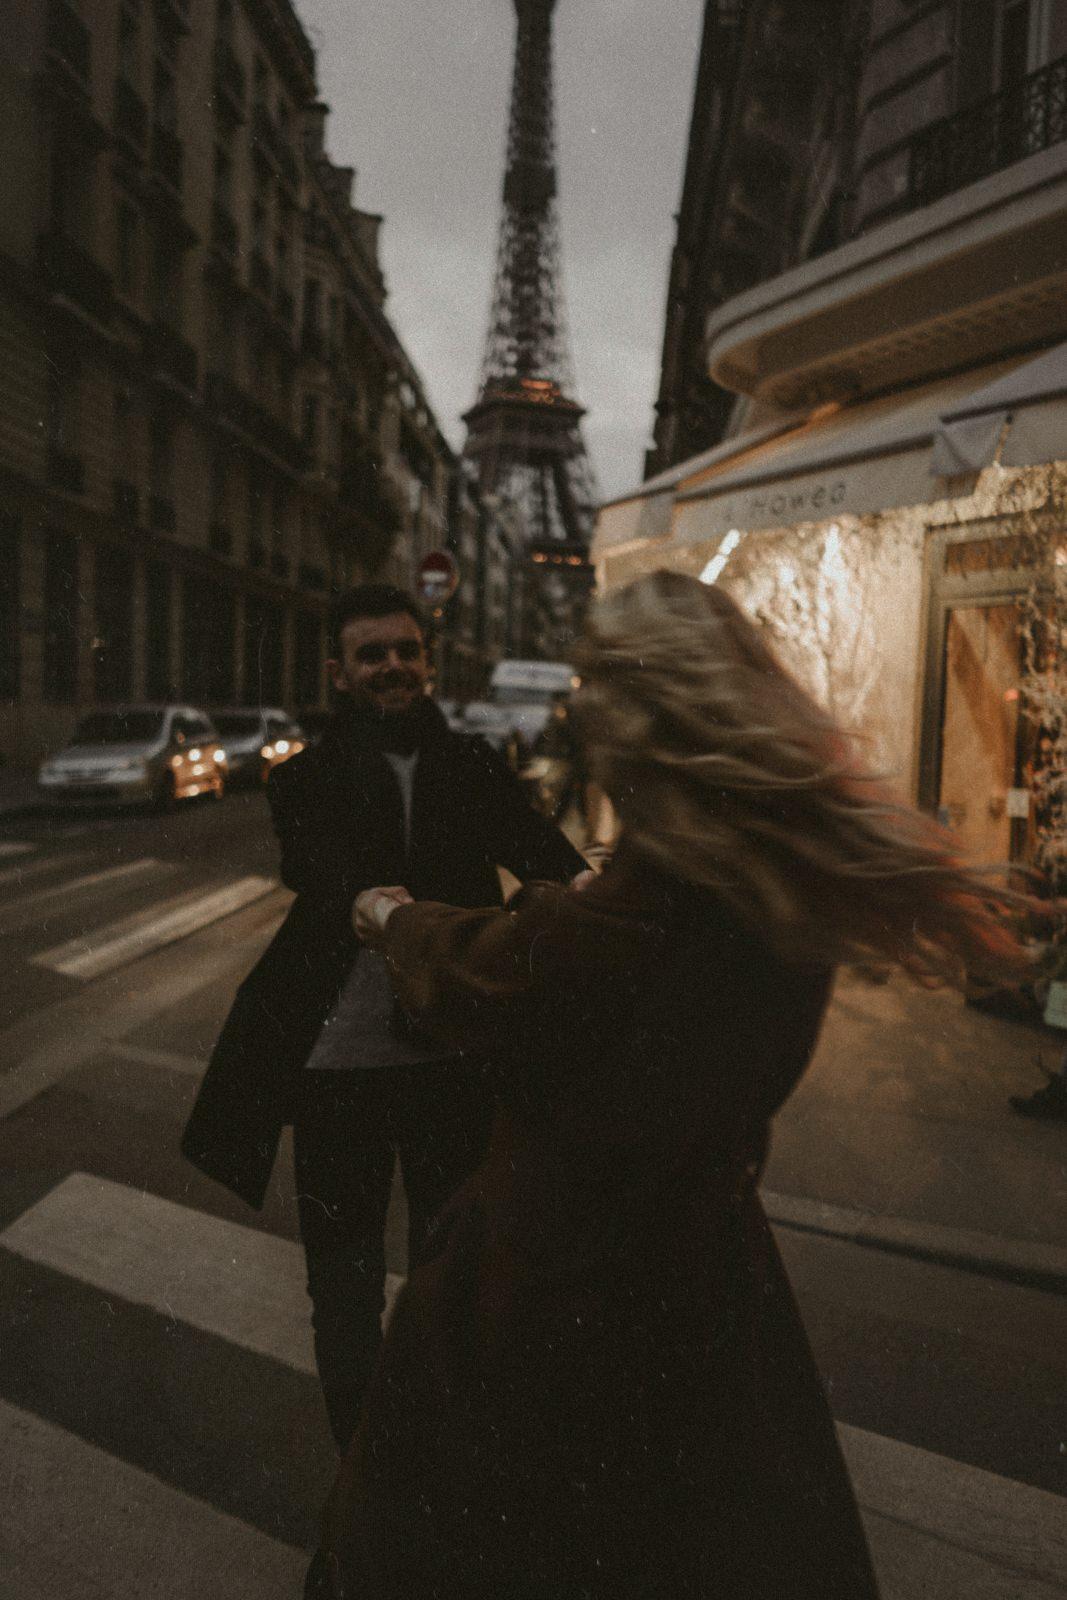 Paris vintage love by Ida-Christine Amerkamp